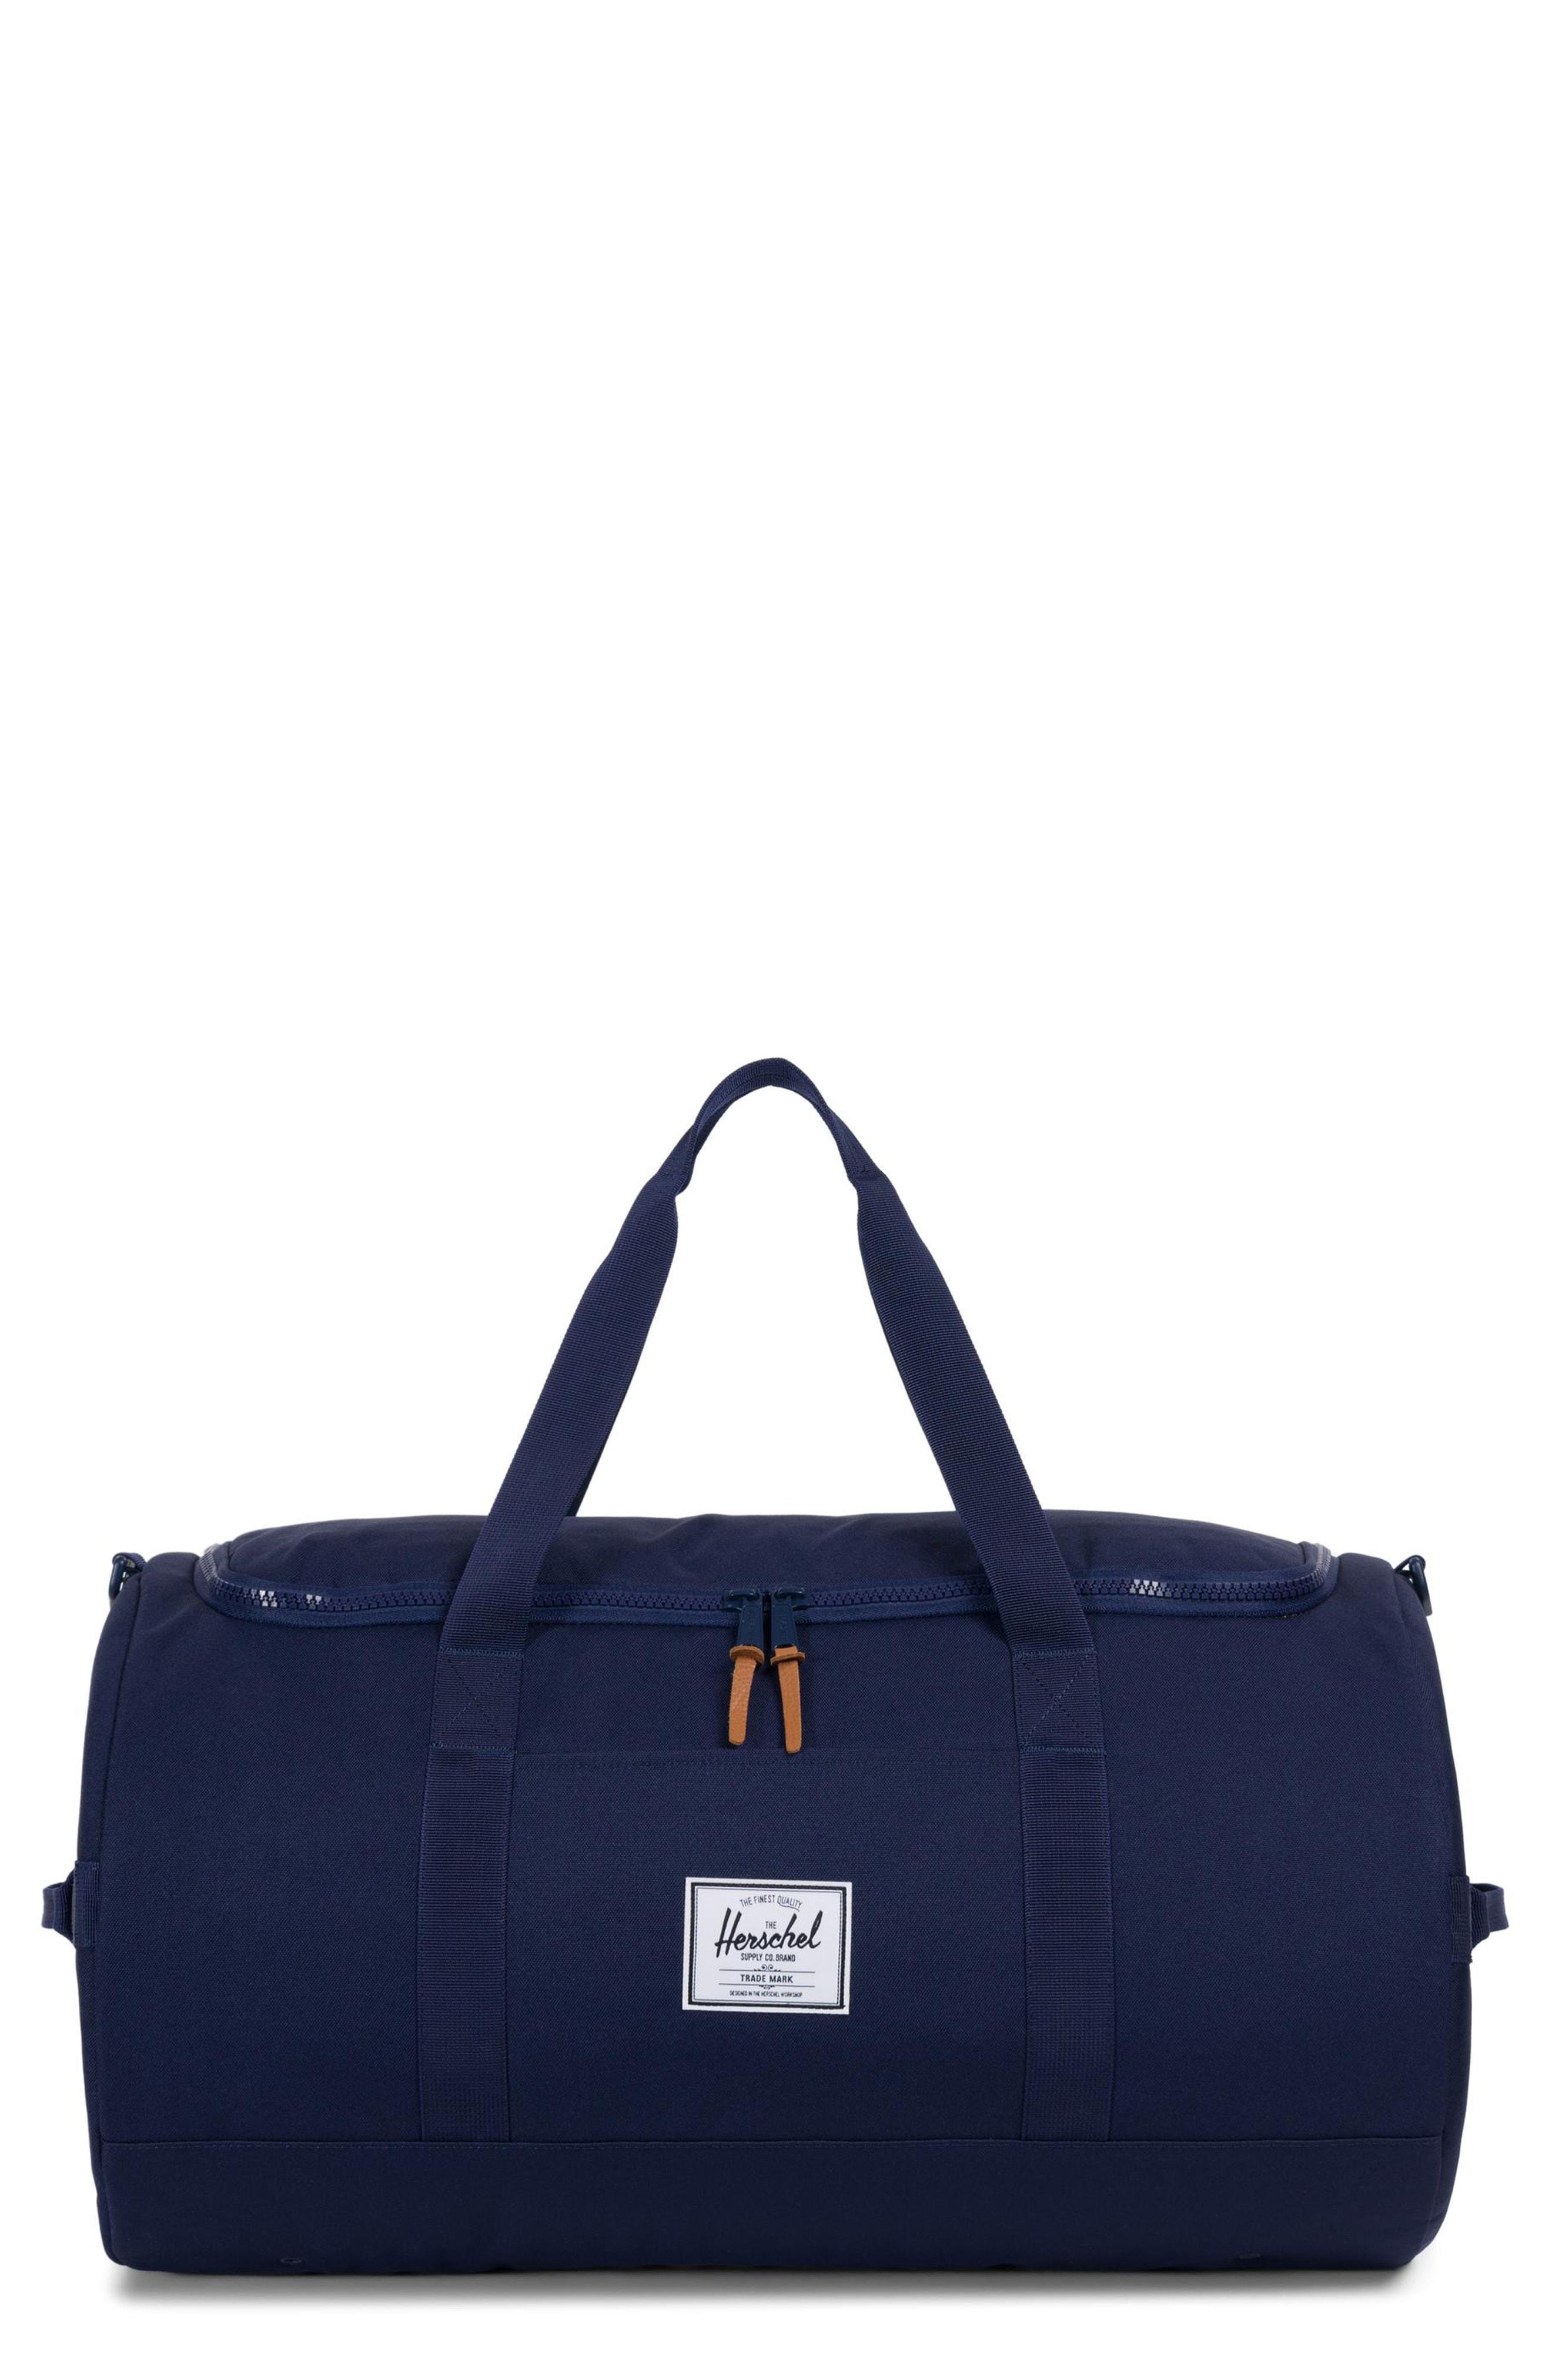 7428ad94a748 Lyst - Herschel Supply Co. Sutton Duffel Bag in Blue for Men